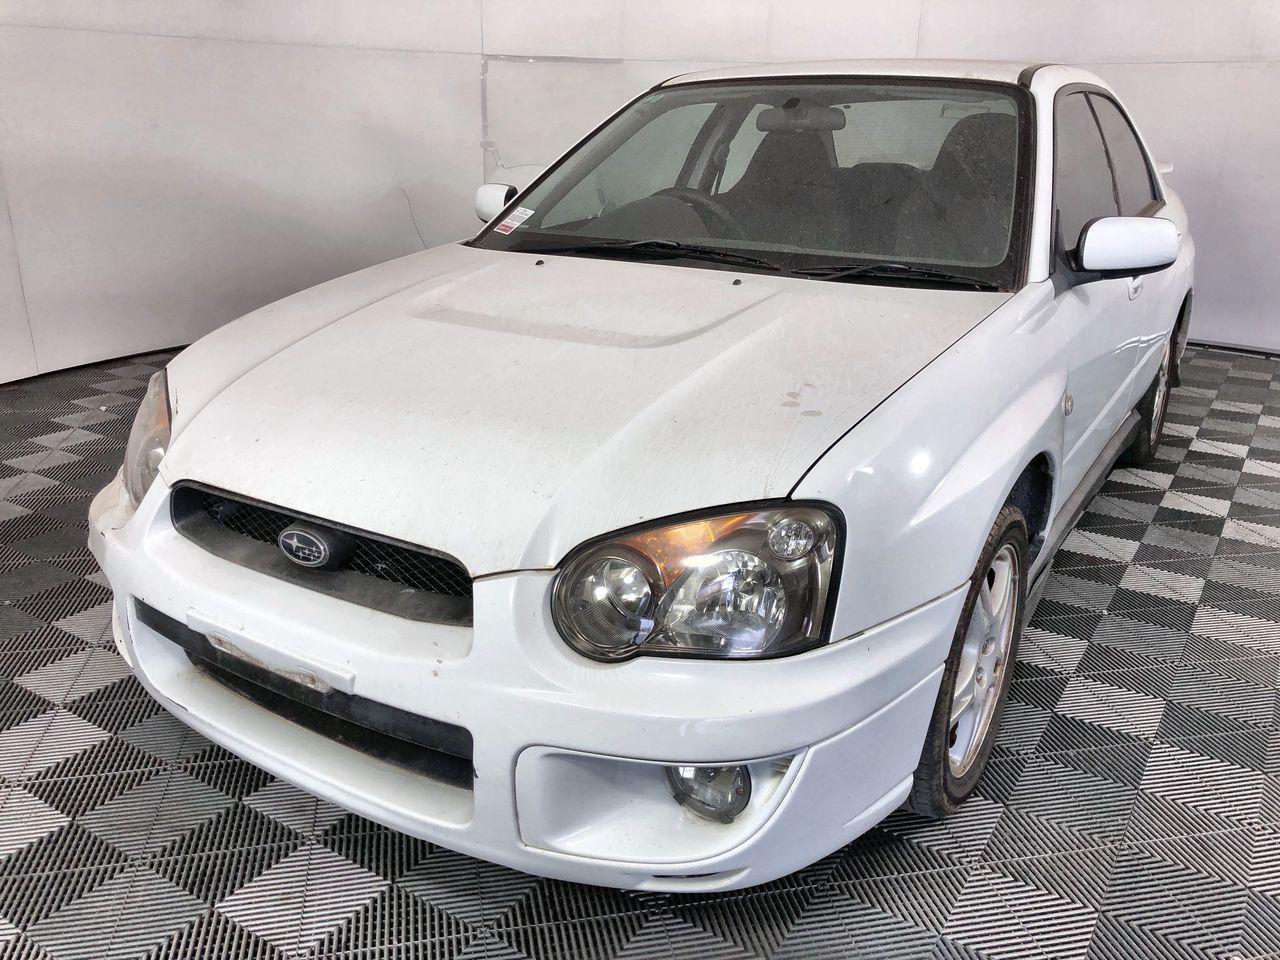 2004 Subaru Impreza RS (AWD) G2 Automatic Sedan